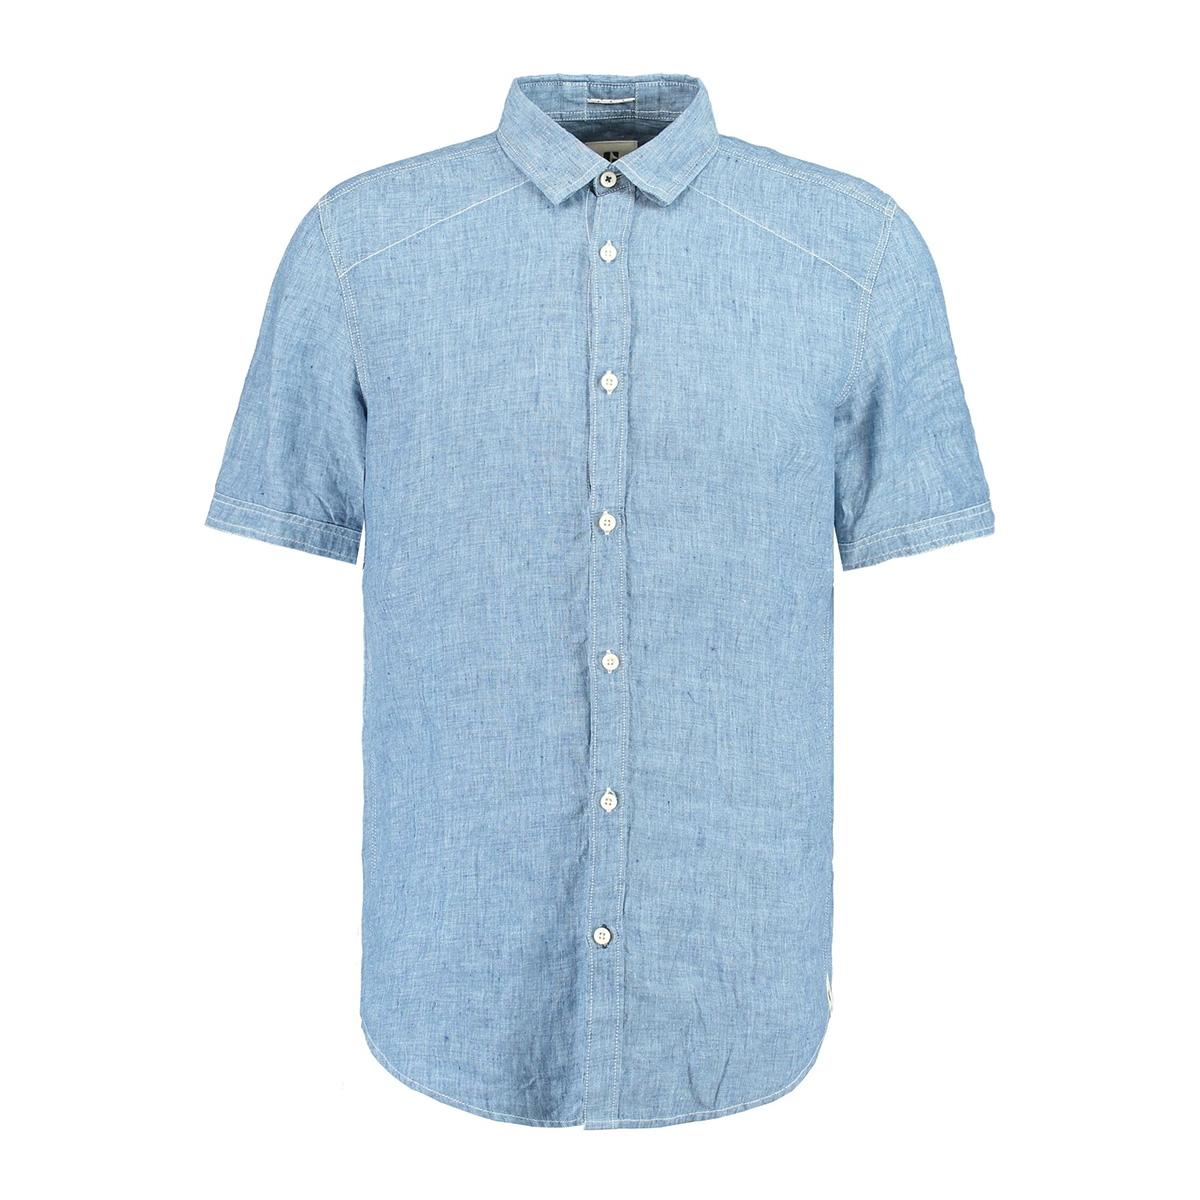 blauw linnen overhemd e91031 garcia overhemd 1050 indigo